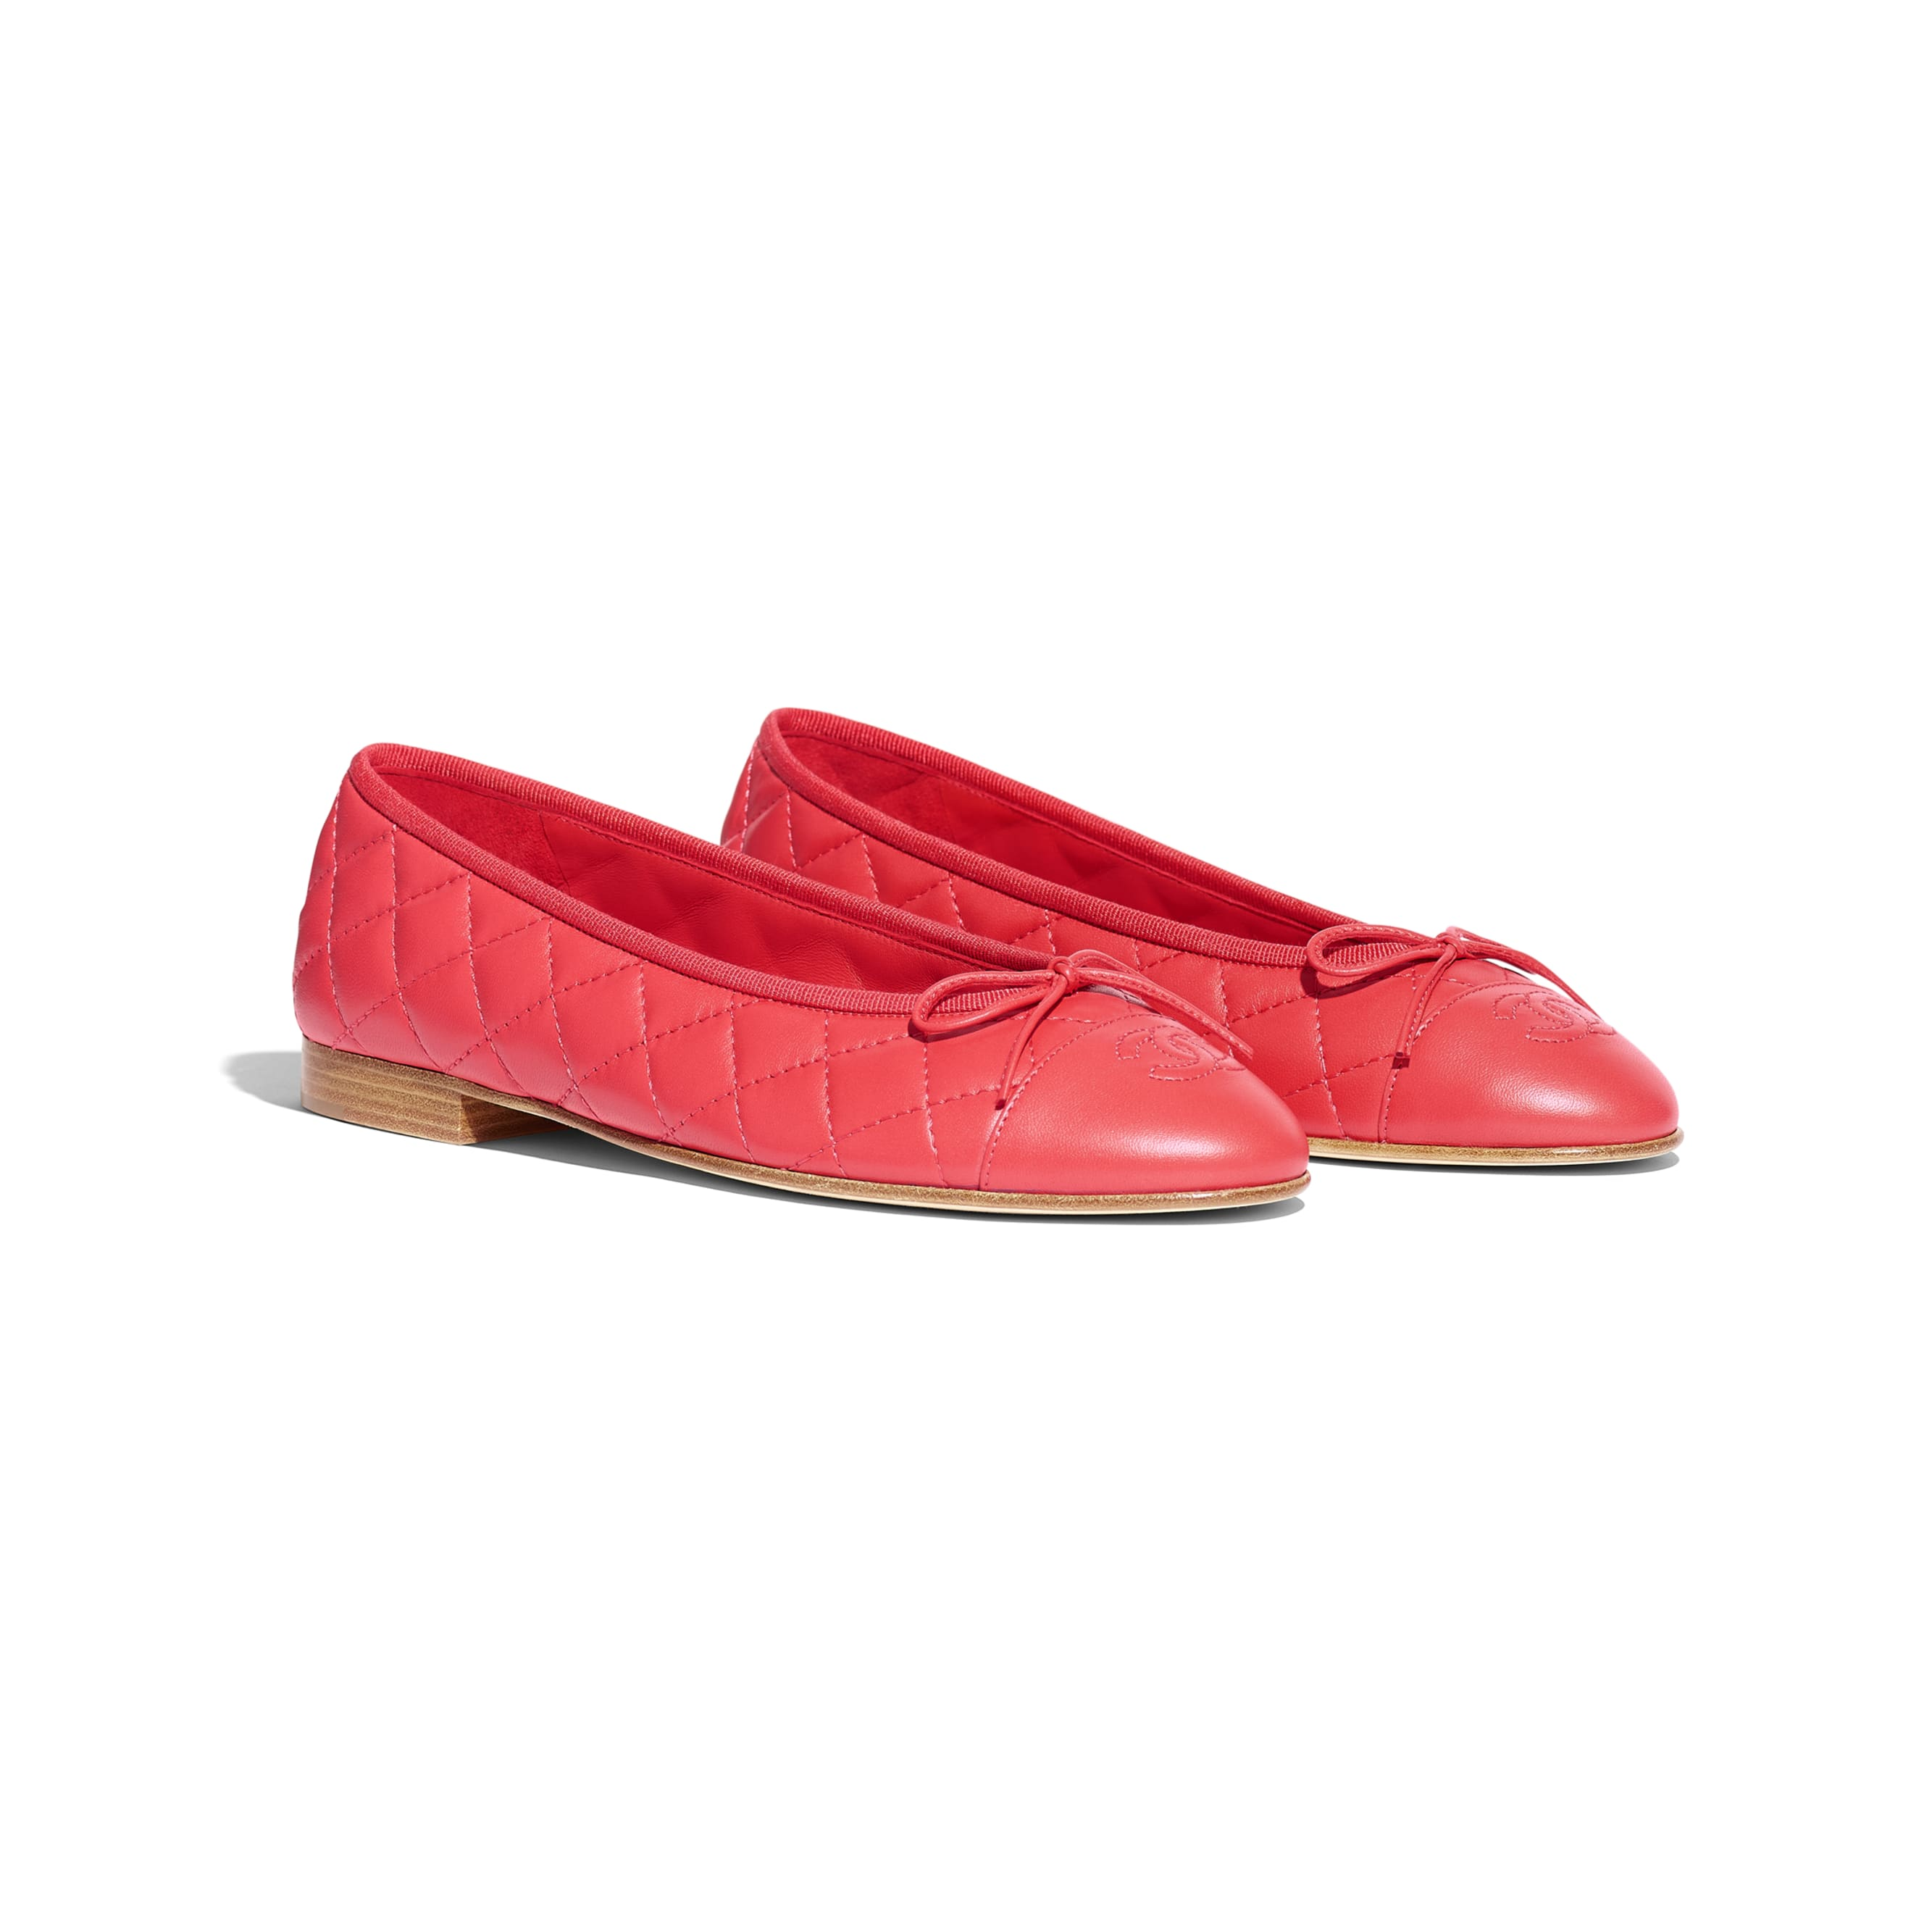 Ballerinas - Red - Lambskin - Alternative view - see standard sized version